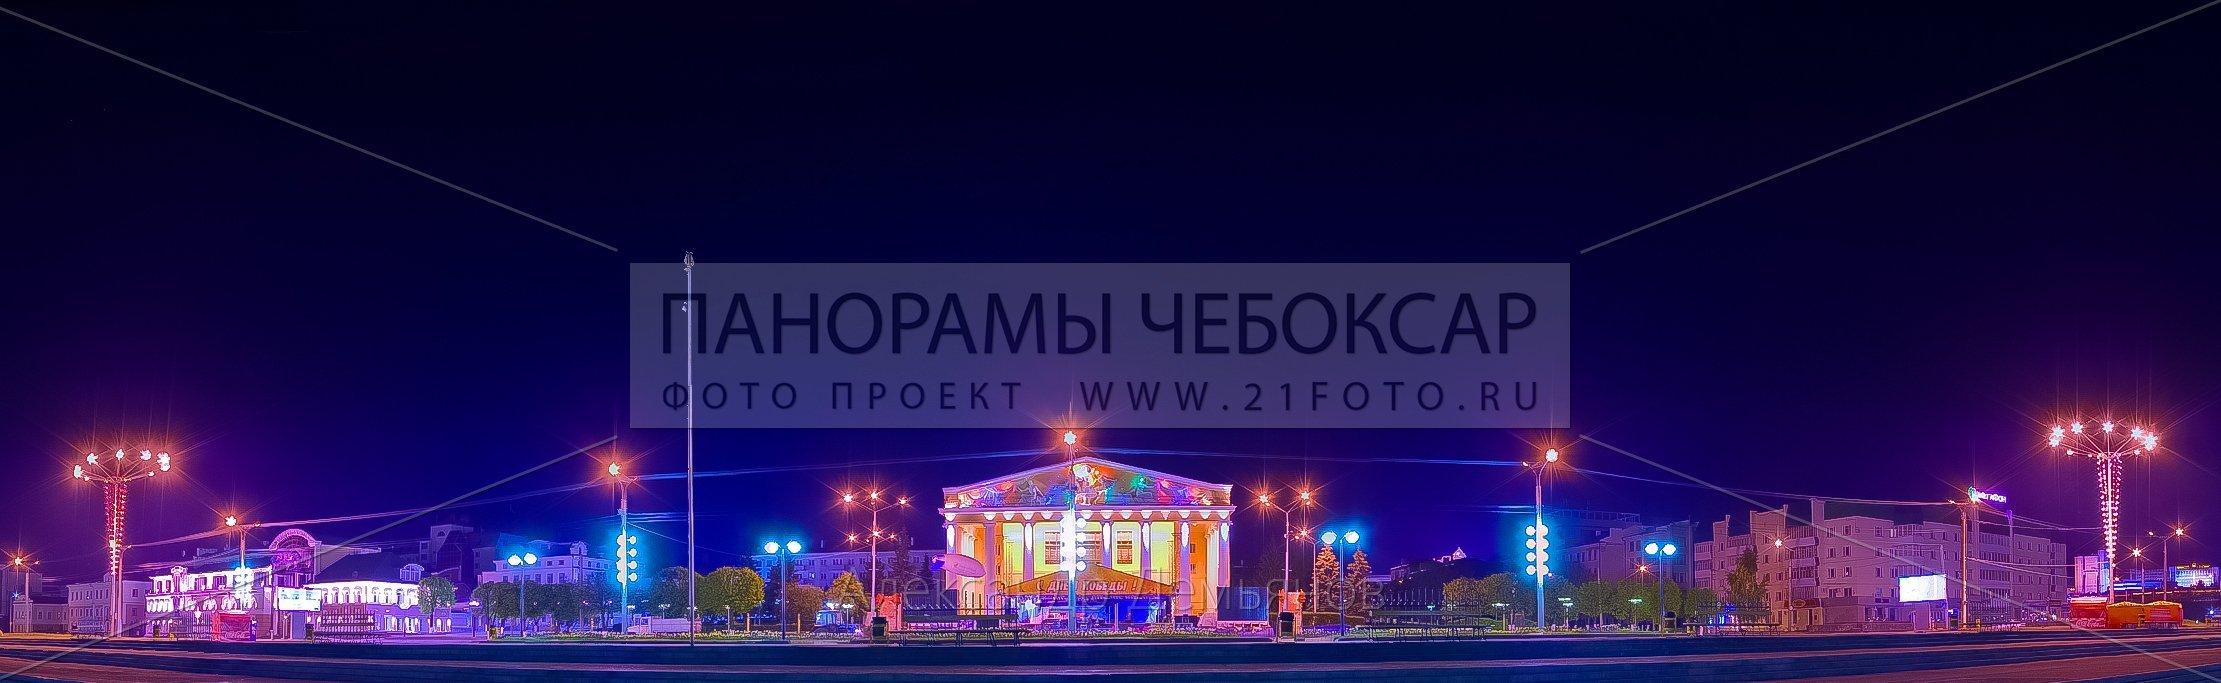 фото панорама Чебоксарская Красная площадь ночью (№5)